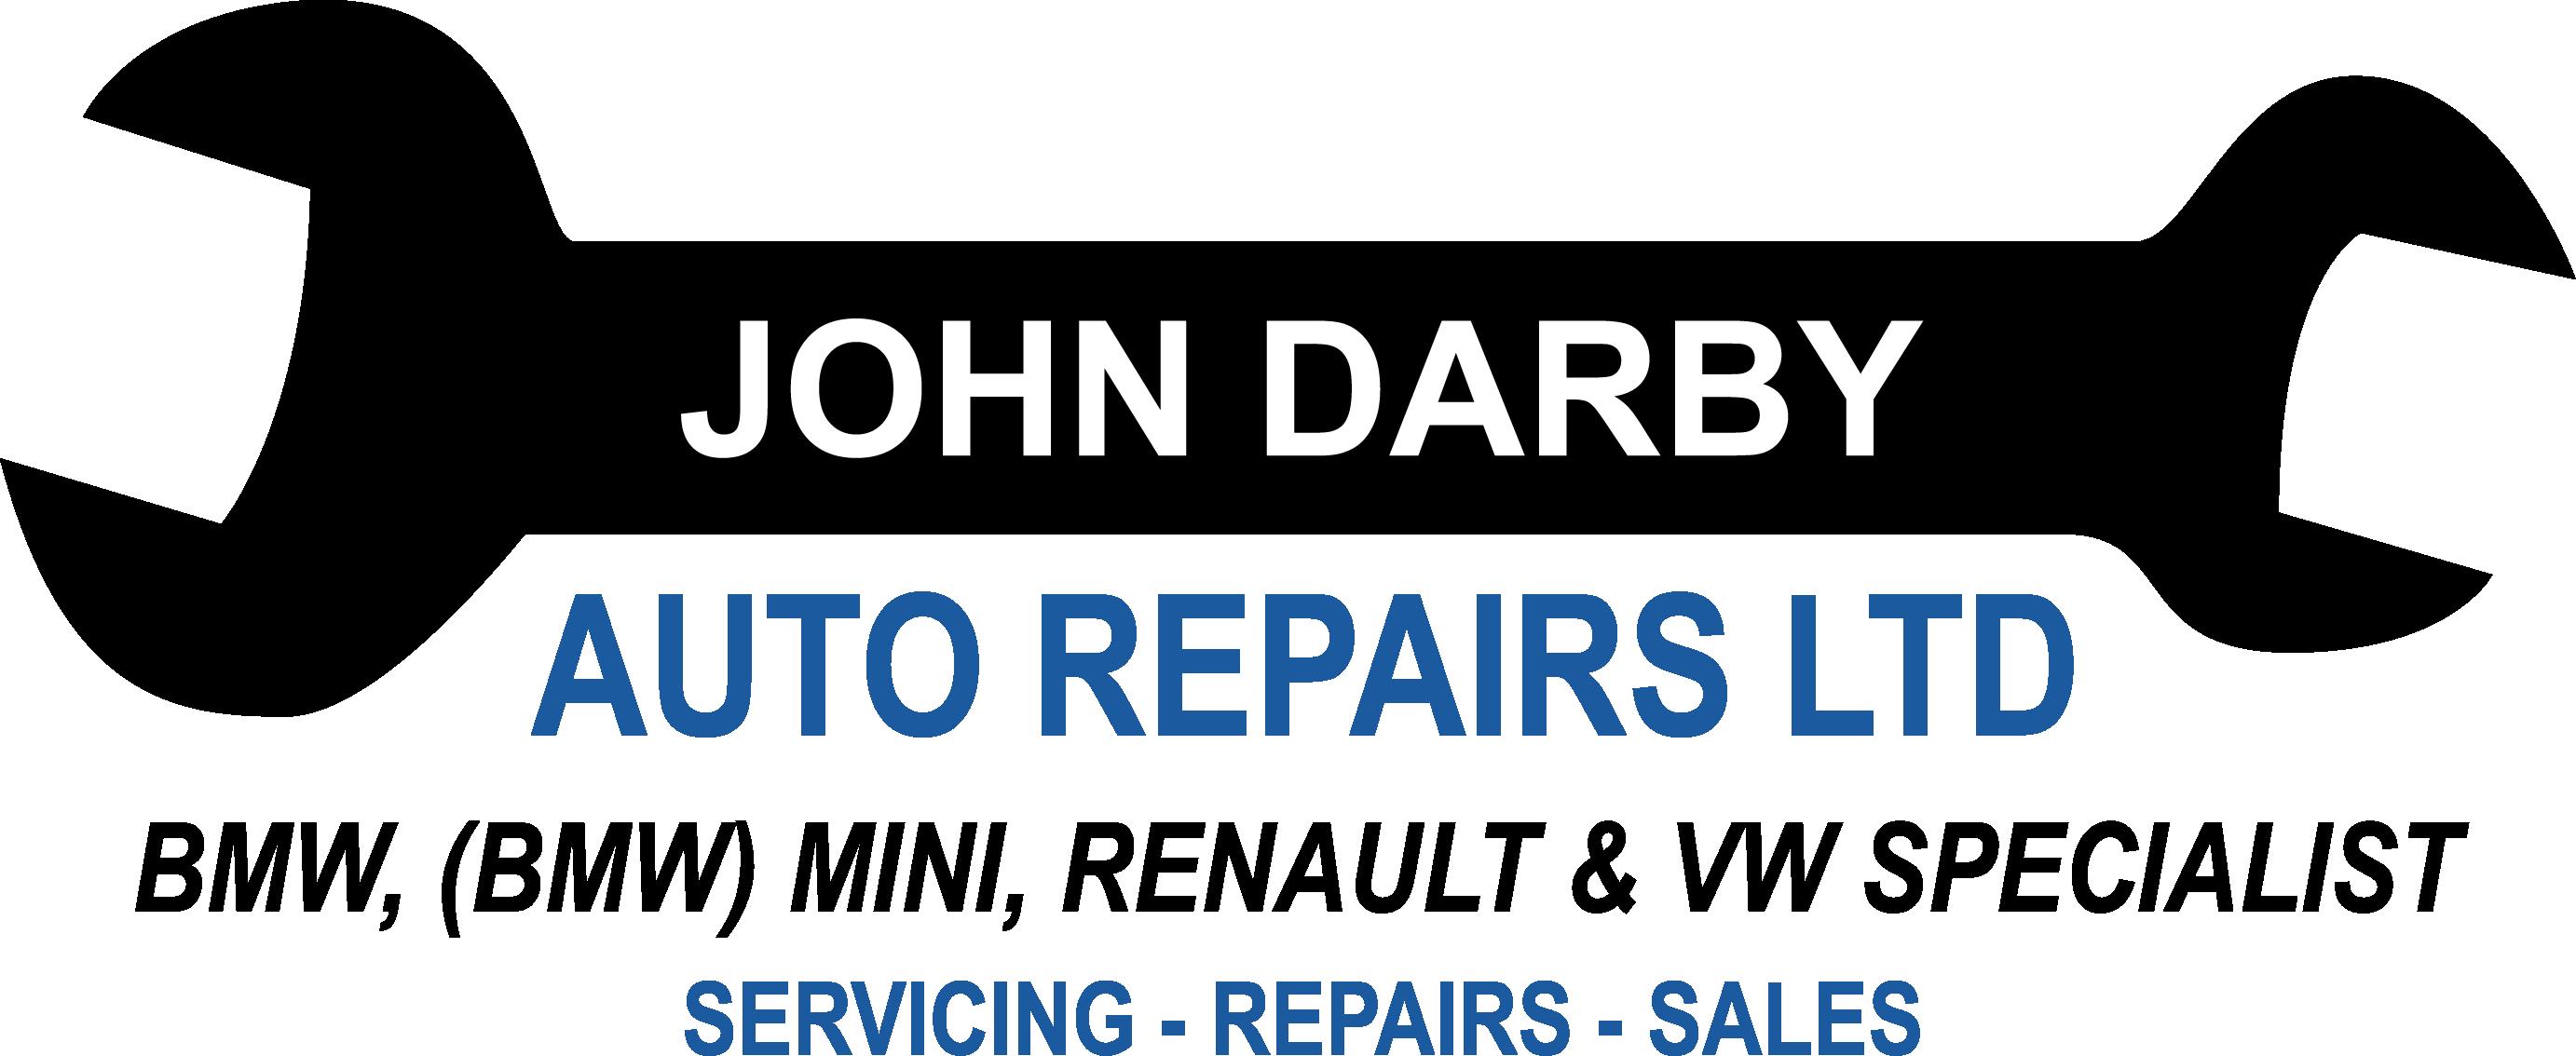 John Darby Auto Repairs Ltd